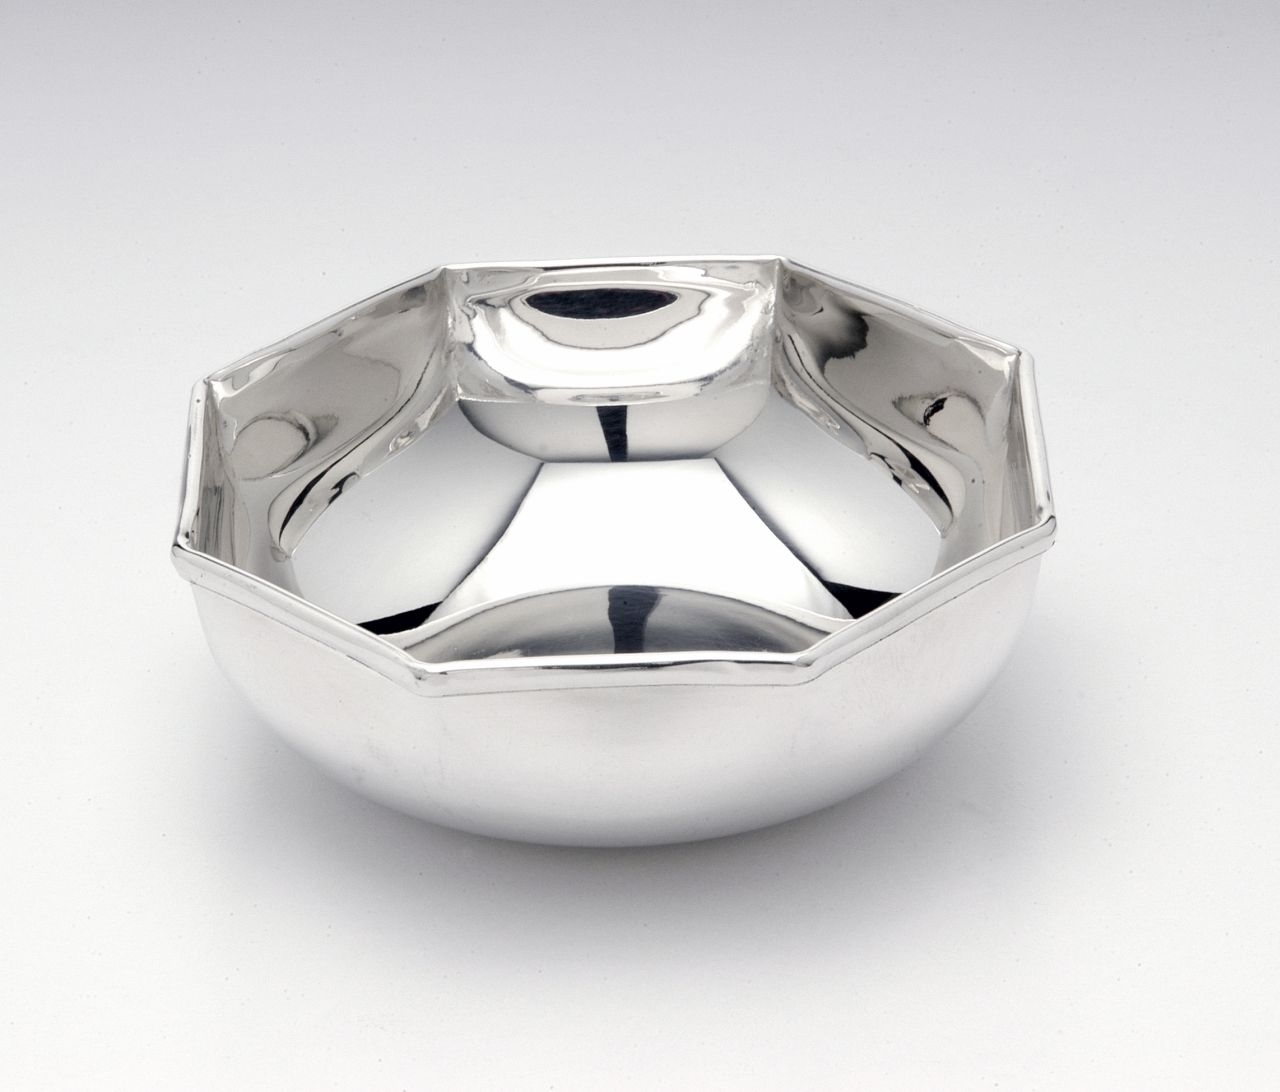 Ciotola ottagonale placcata argento